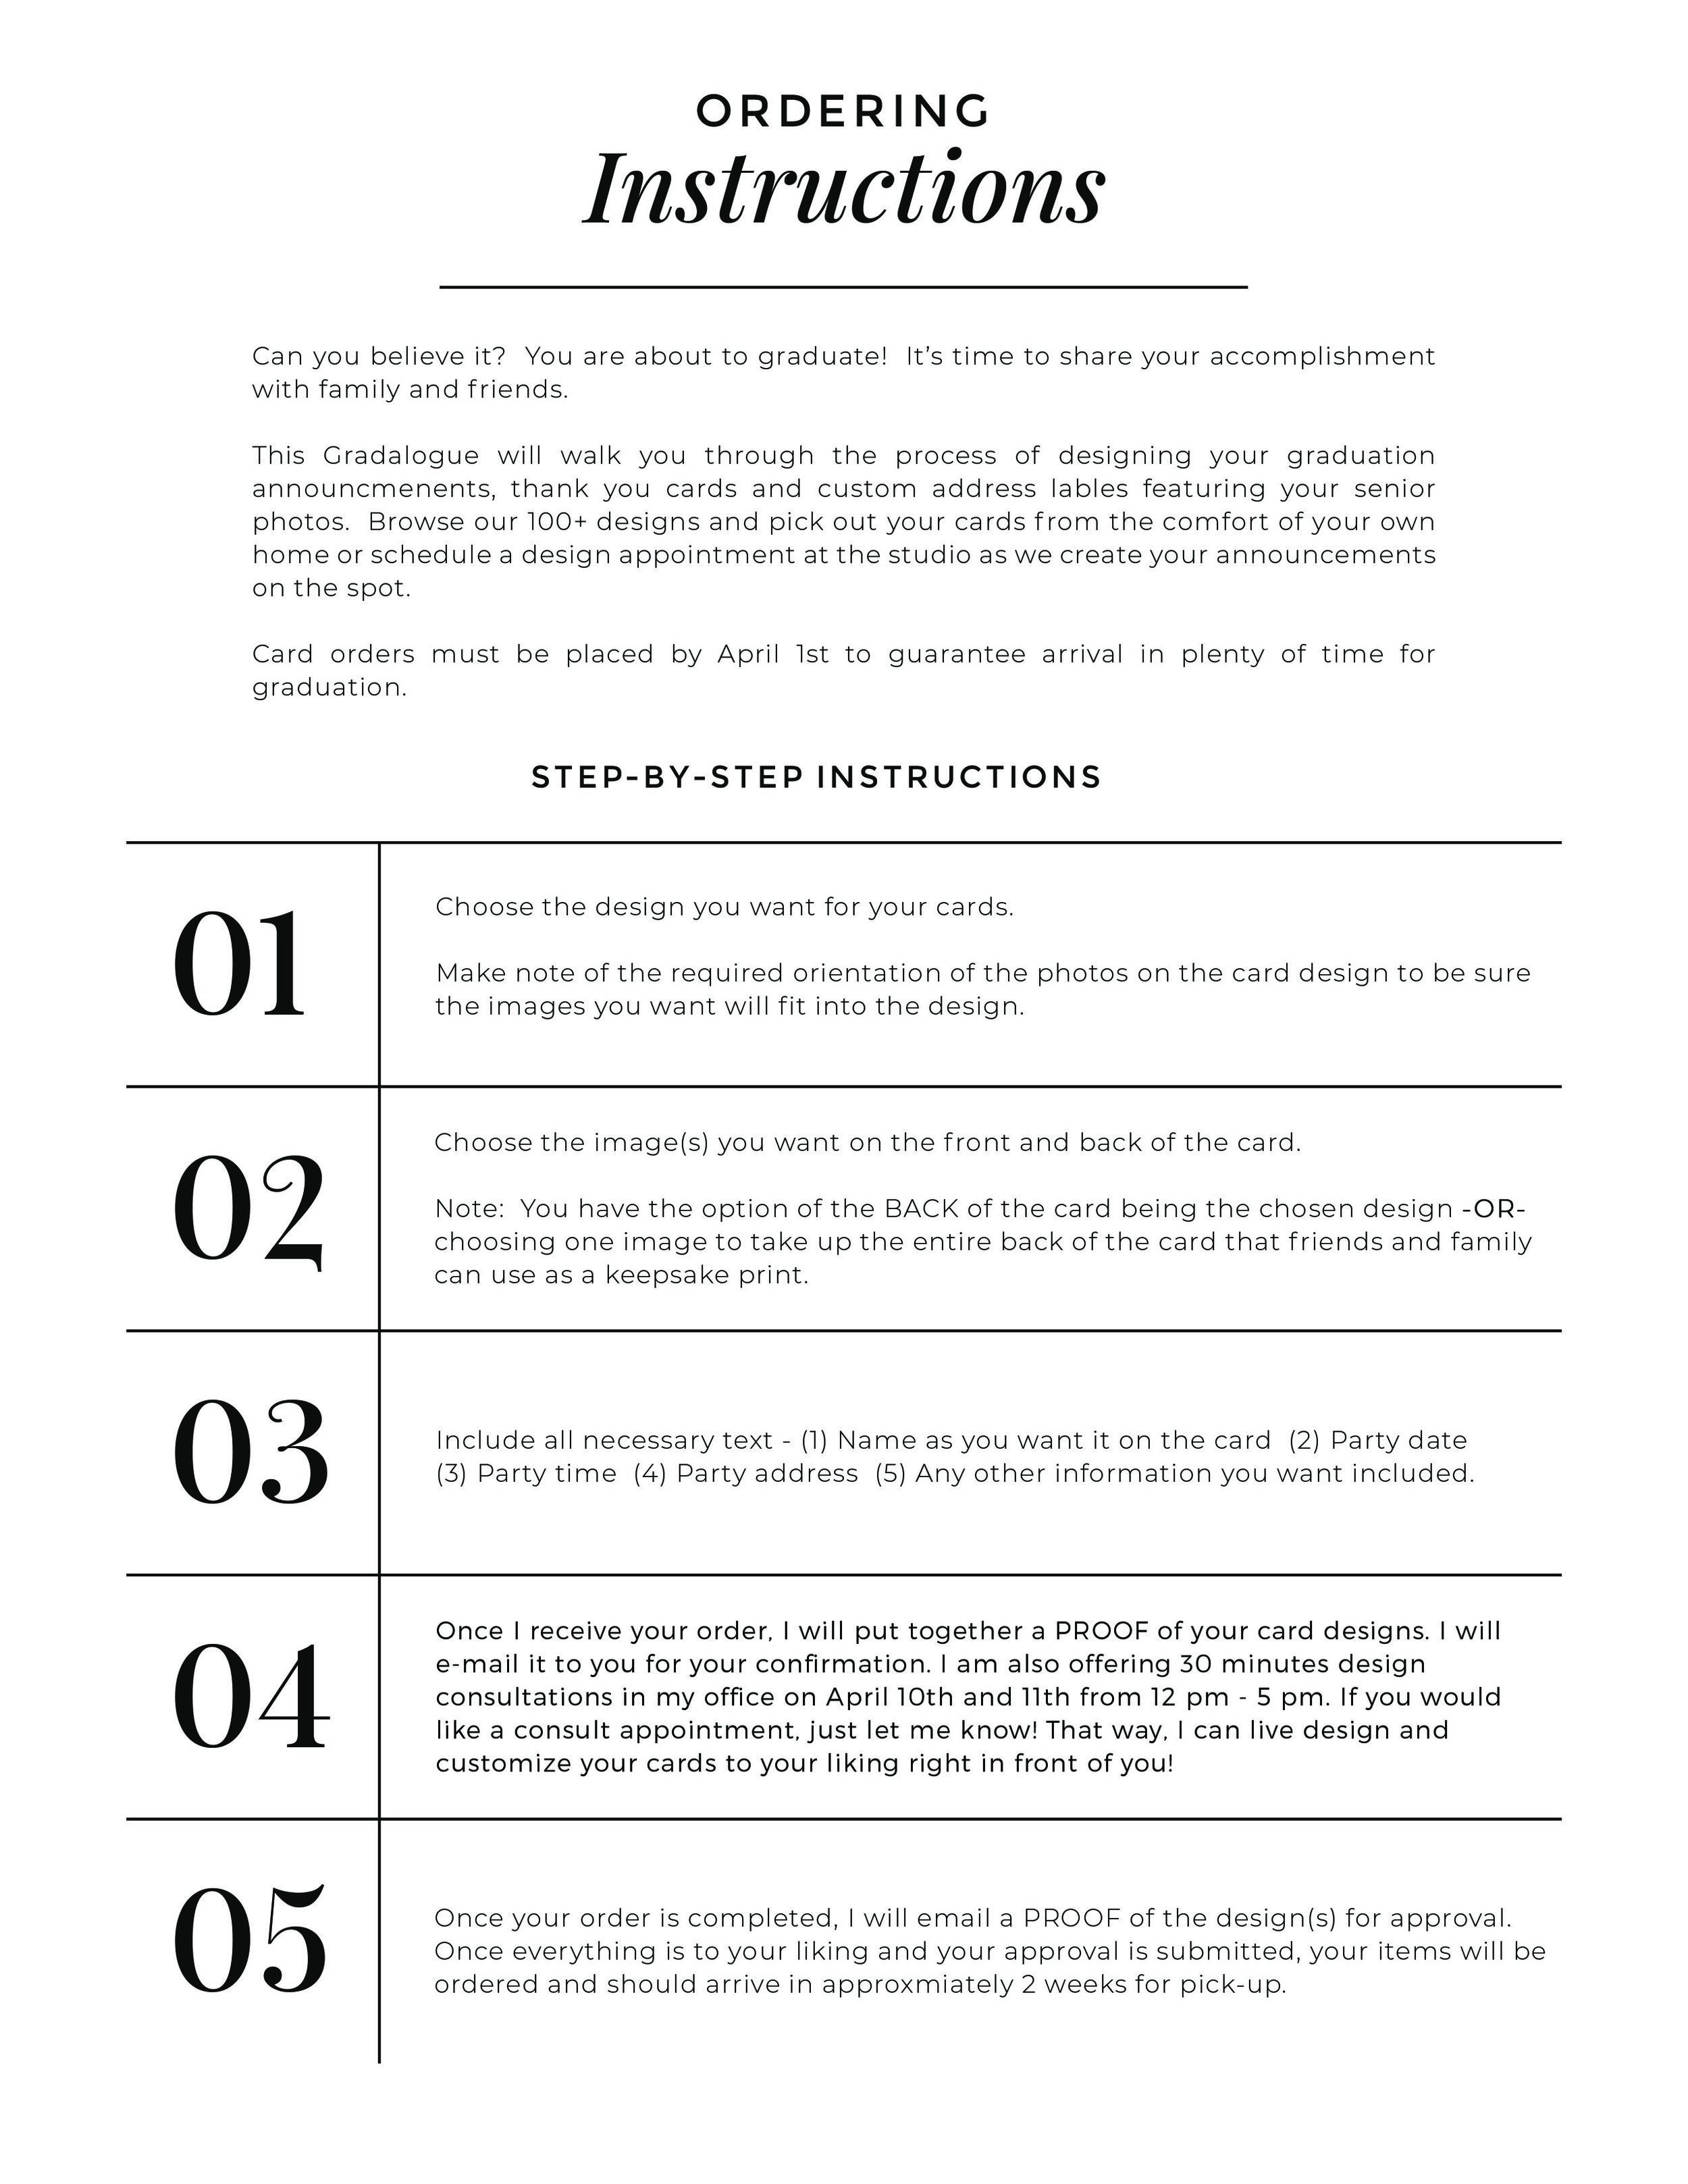 02 - Gradalogue-OrderingInstructions.jpg